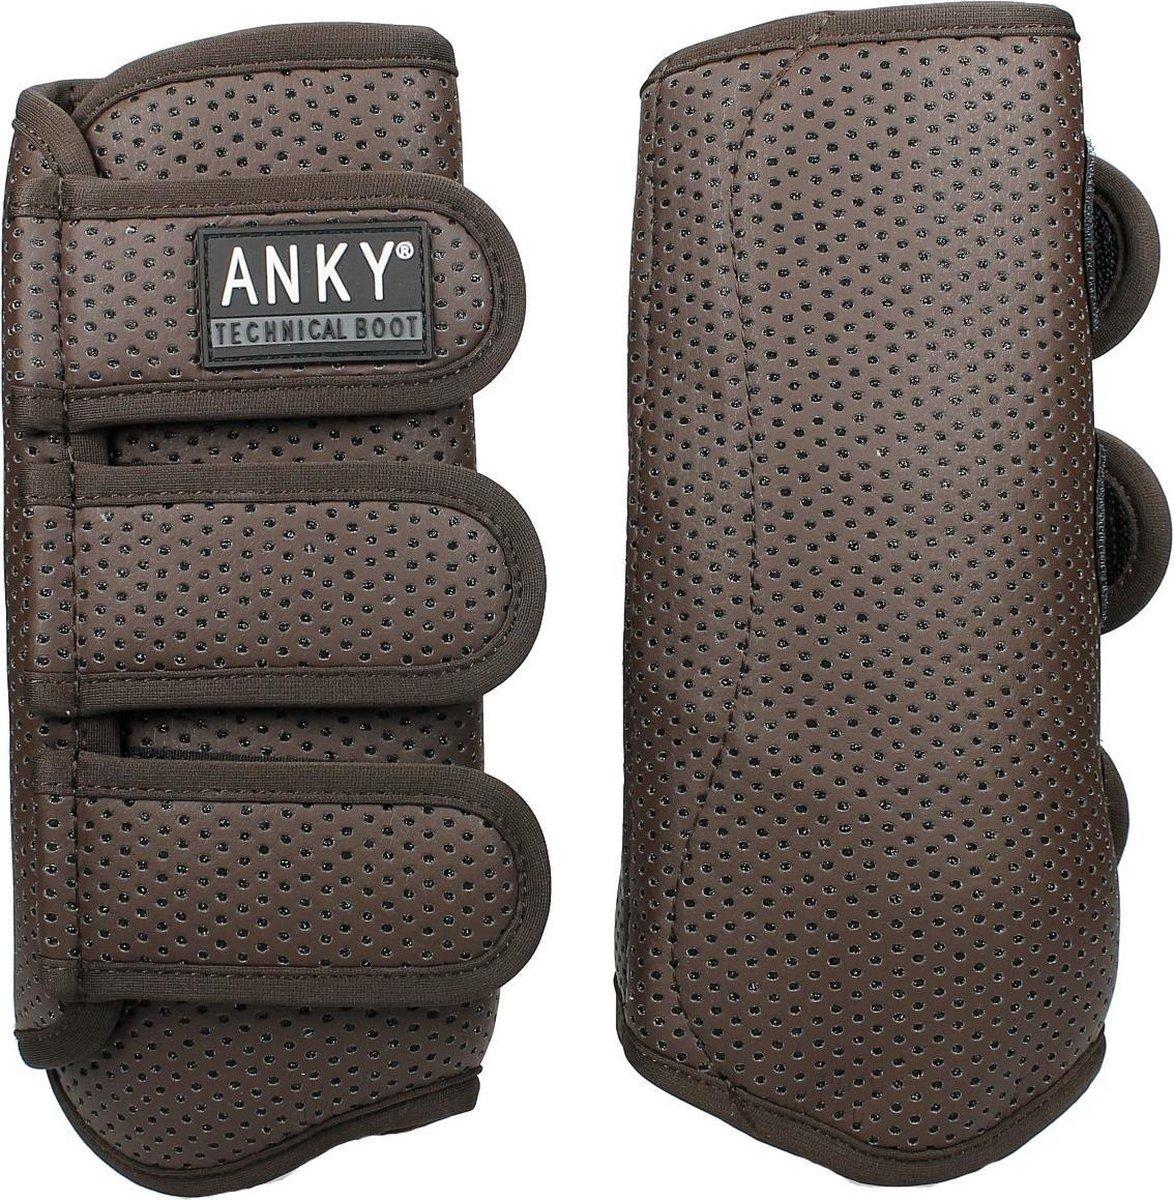 ANKY Technical Boot Matt-Climatrole - Anky Technical Casuals